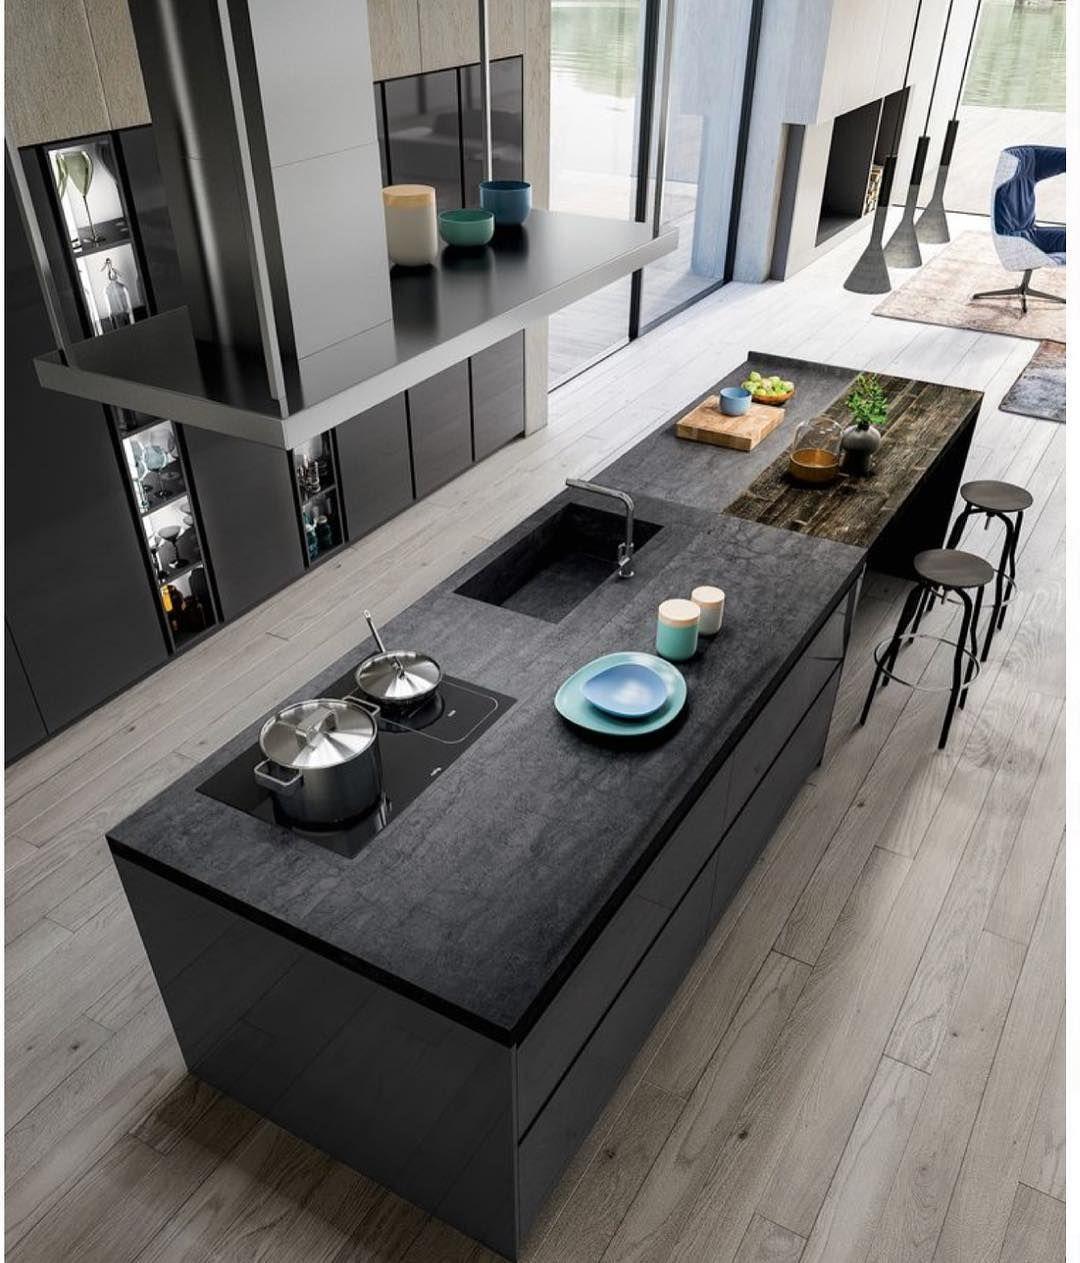 Kuri On Instagram Modernhome Modernsink Moderliving Modernhouse Luxurylifestyle Luxurylife Luxuryde Avec Images Cuisine Moderne Cuisine Loft Decoration De Cuisine